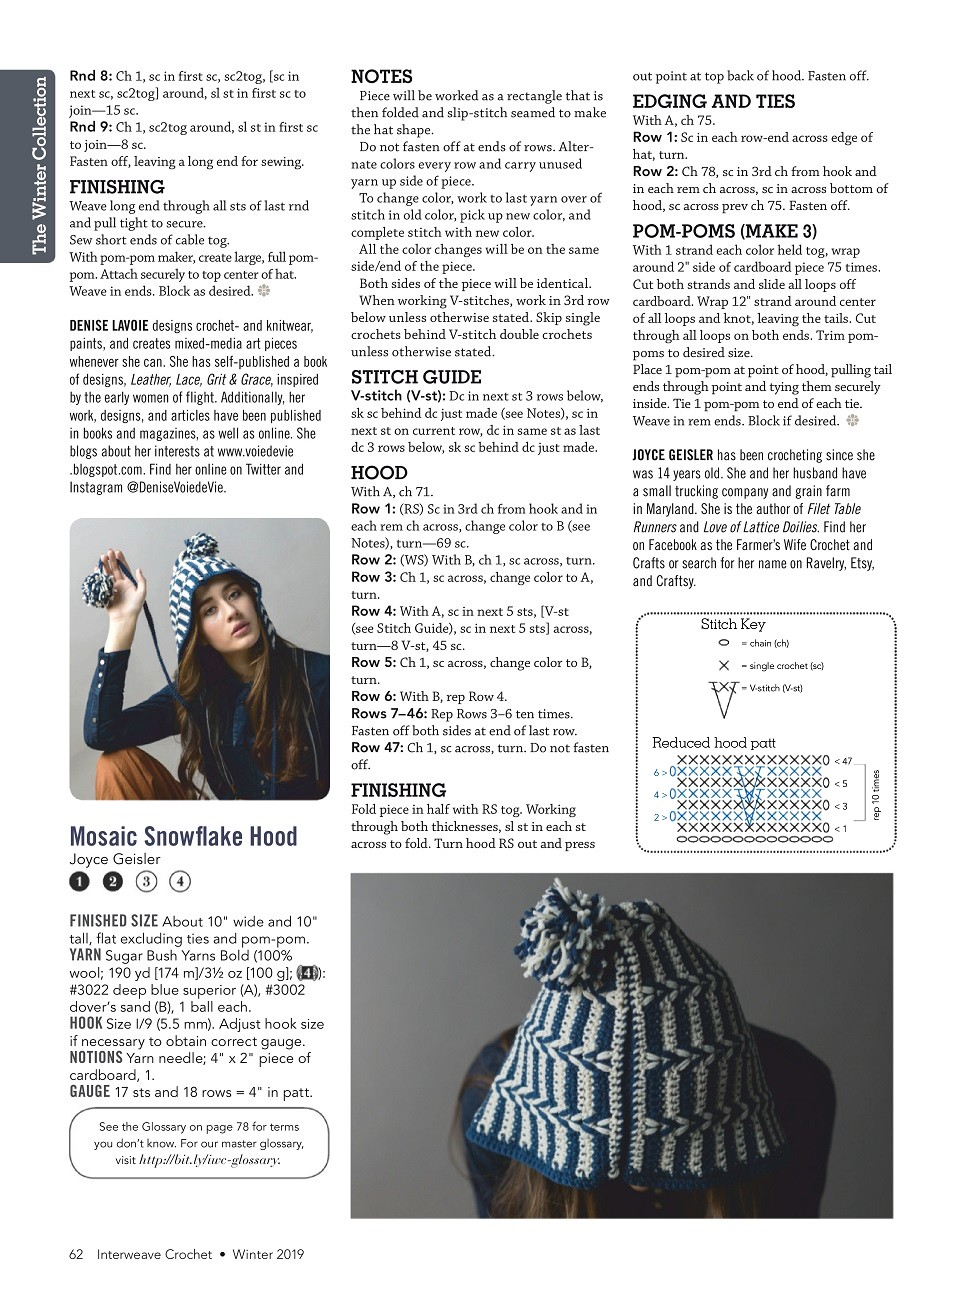 Interweave Crochet Winter 2019-63